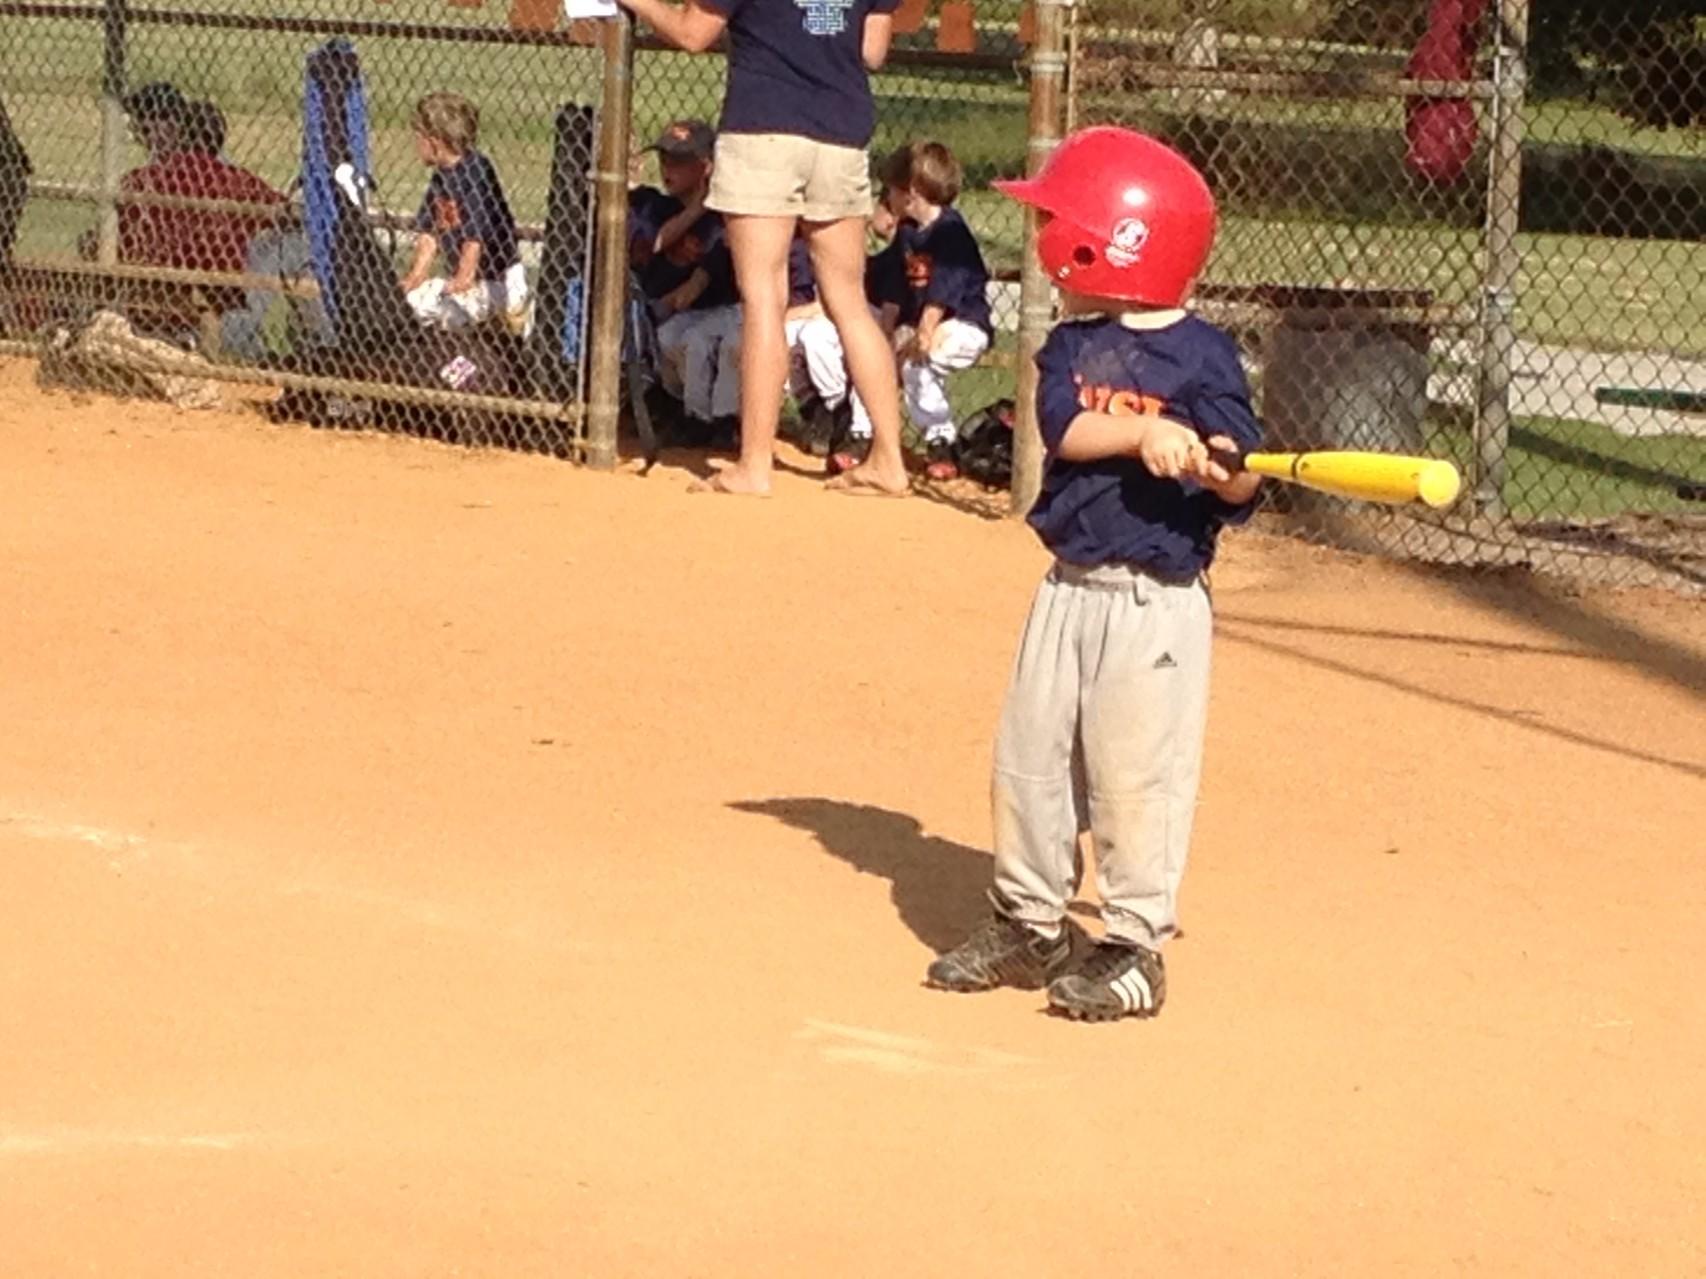 kleiner Baseballspieler